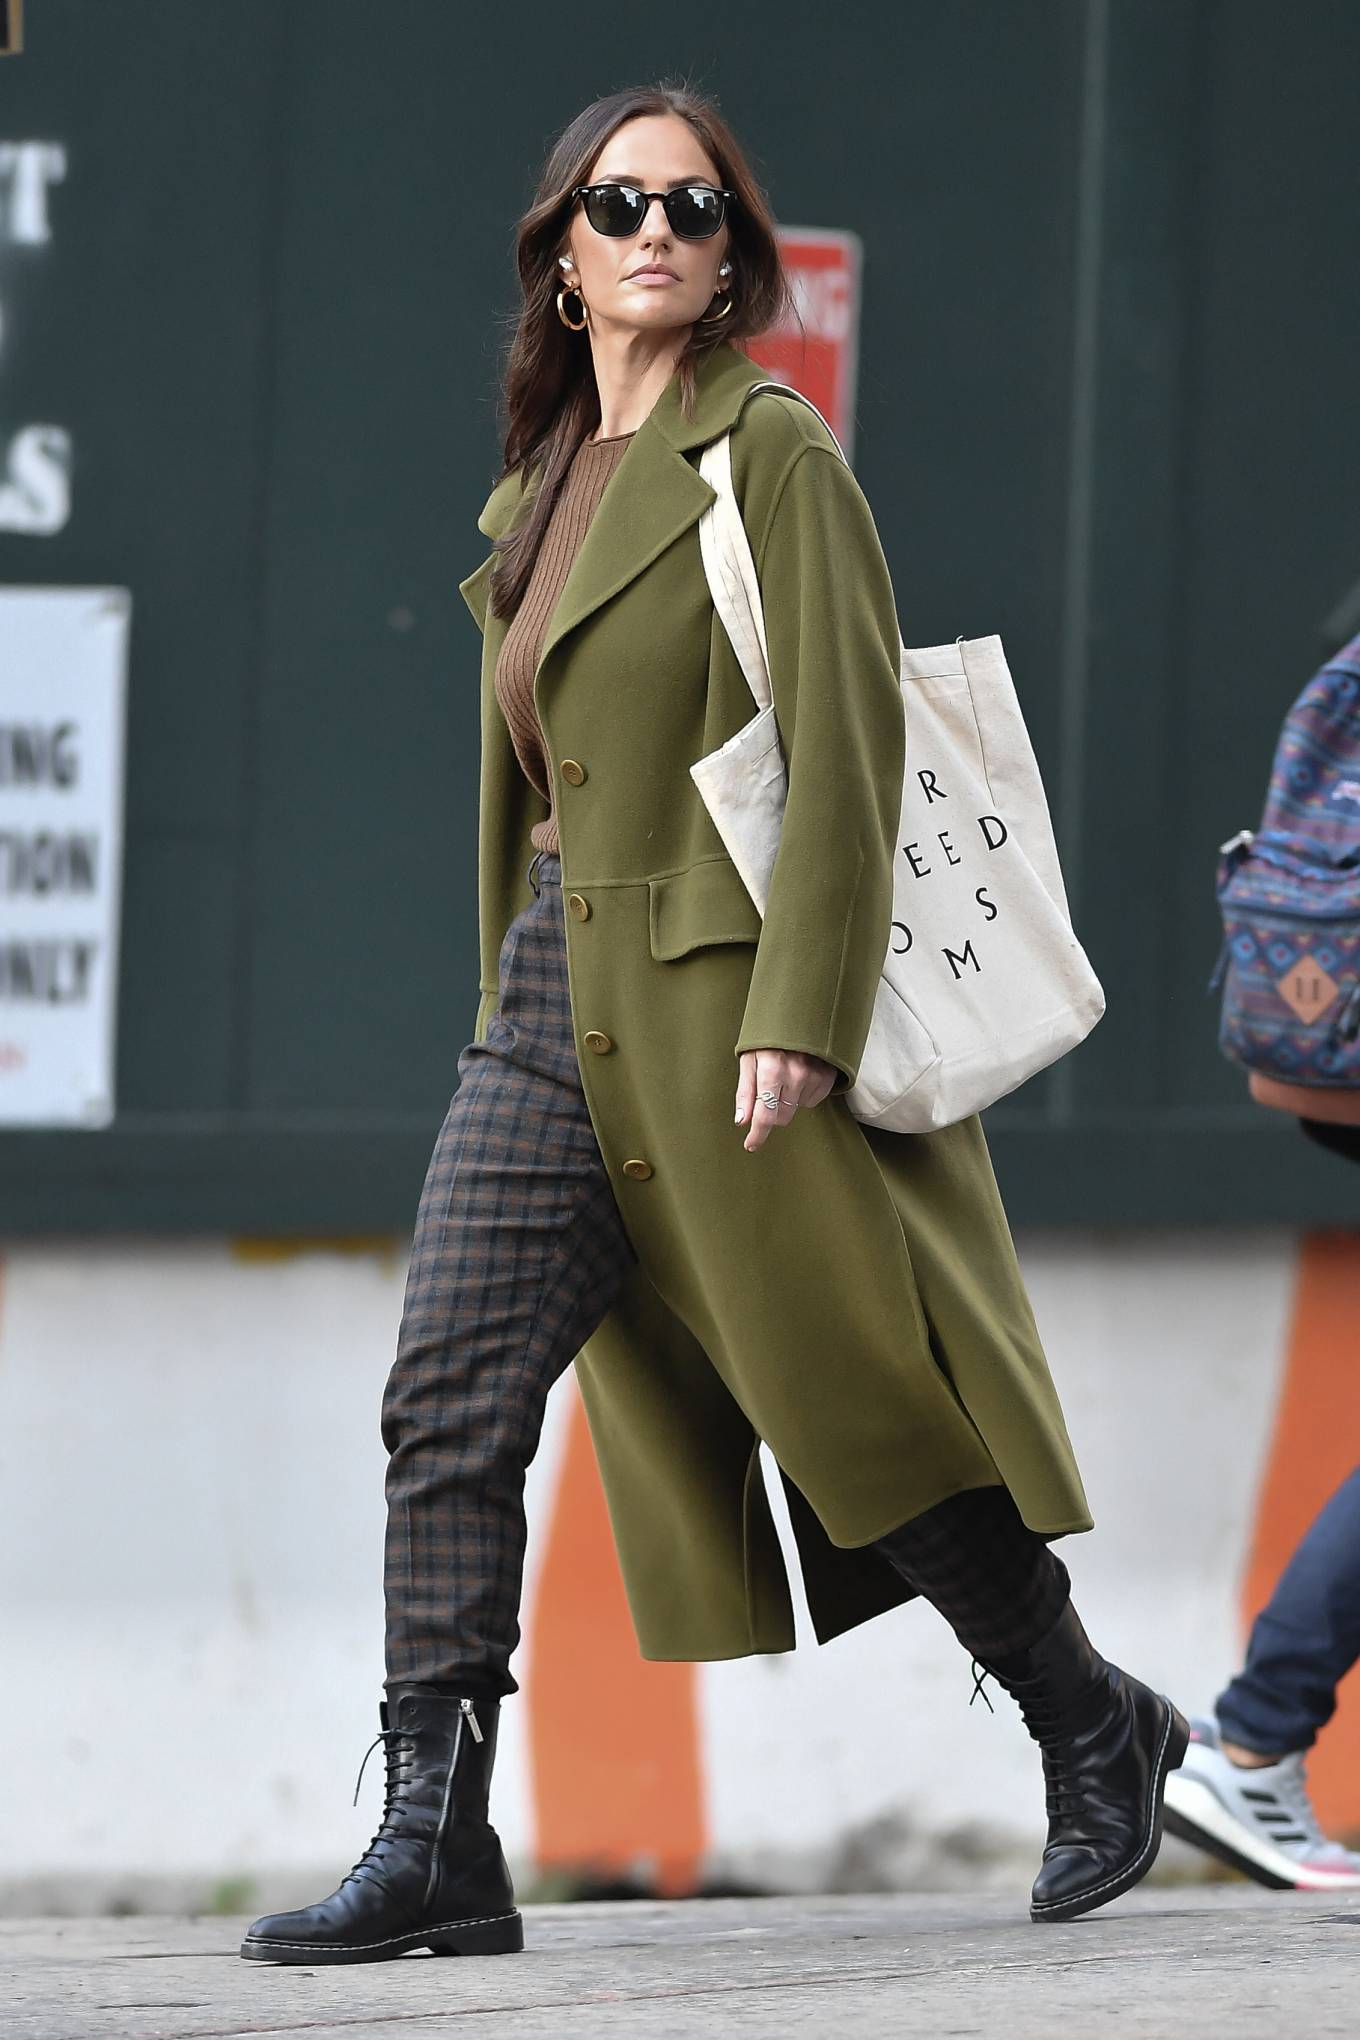 Minka Kelly 2021 : Minka Kelly – In olive green runs errands in New York-16